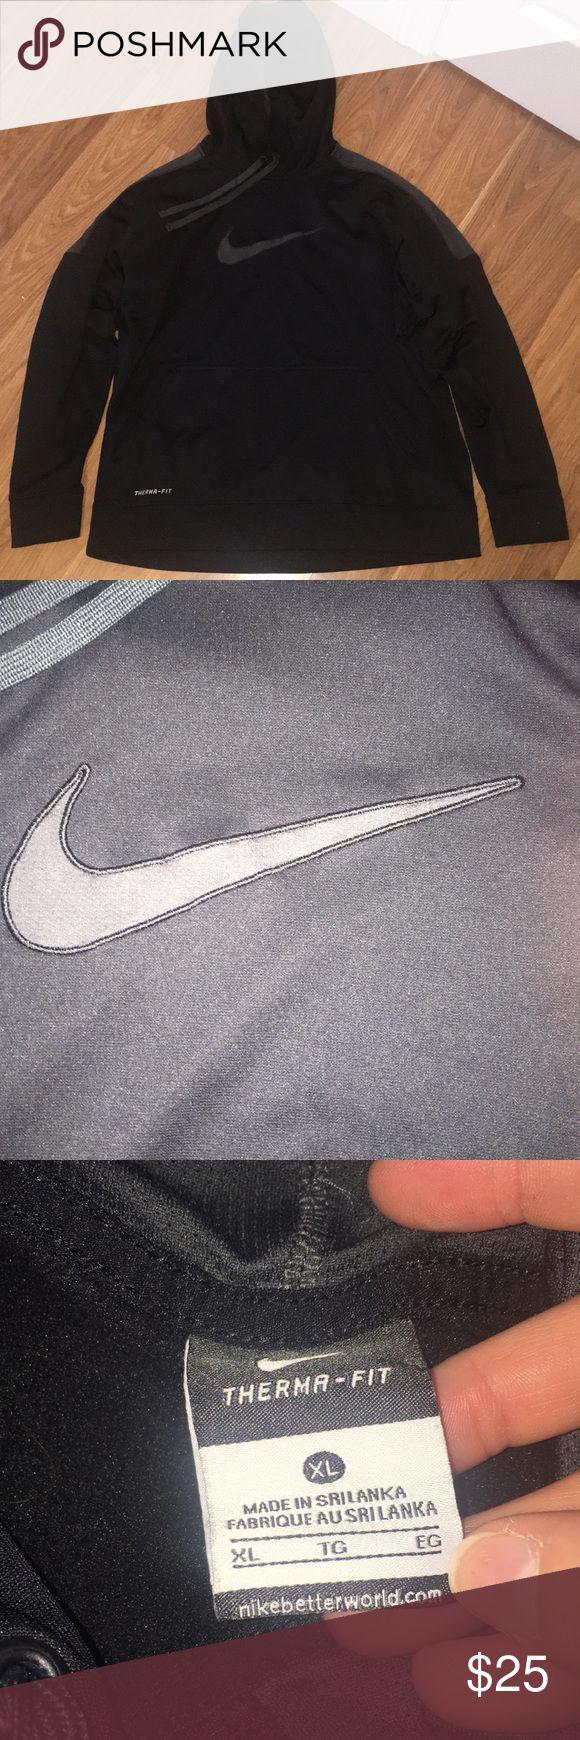 Black and Grey Nike Hoody Black and grey Nike Hoody barely worn Nike Jackets & Coats